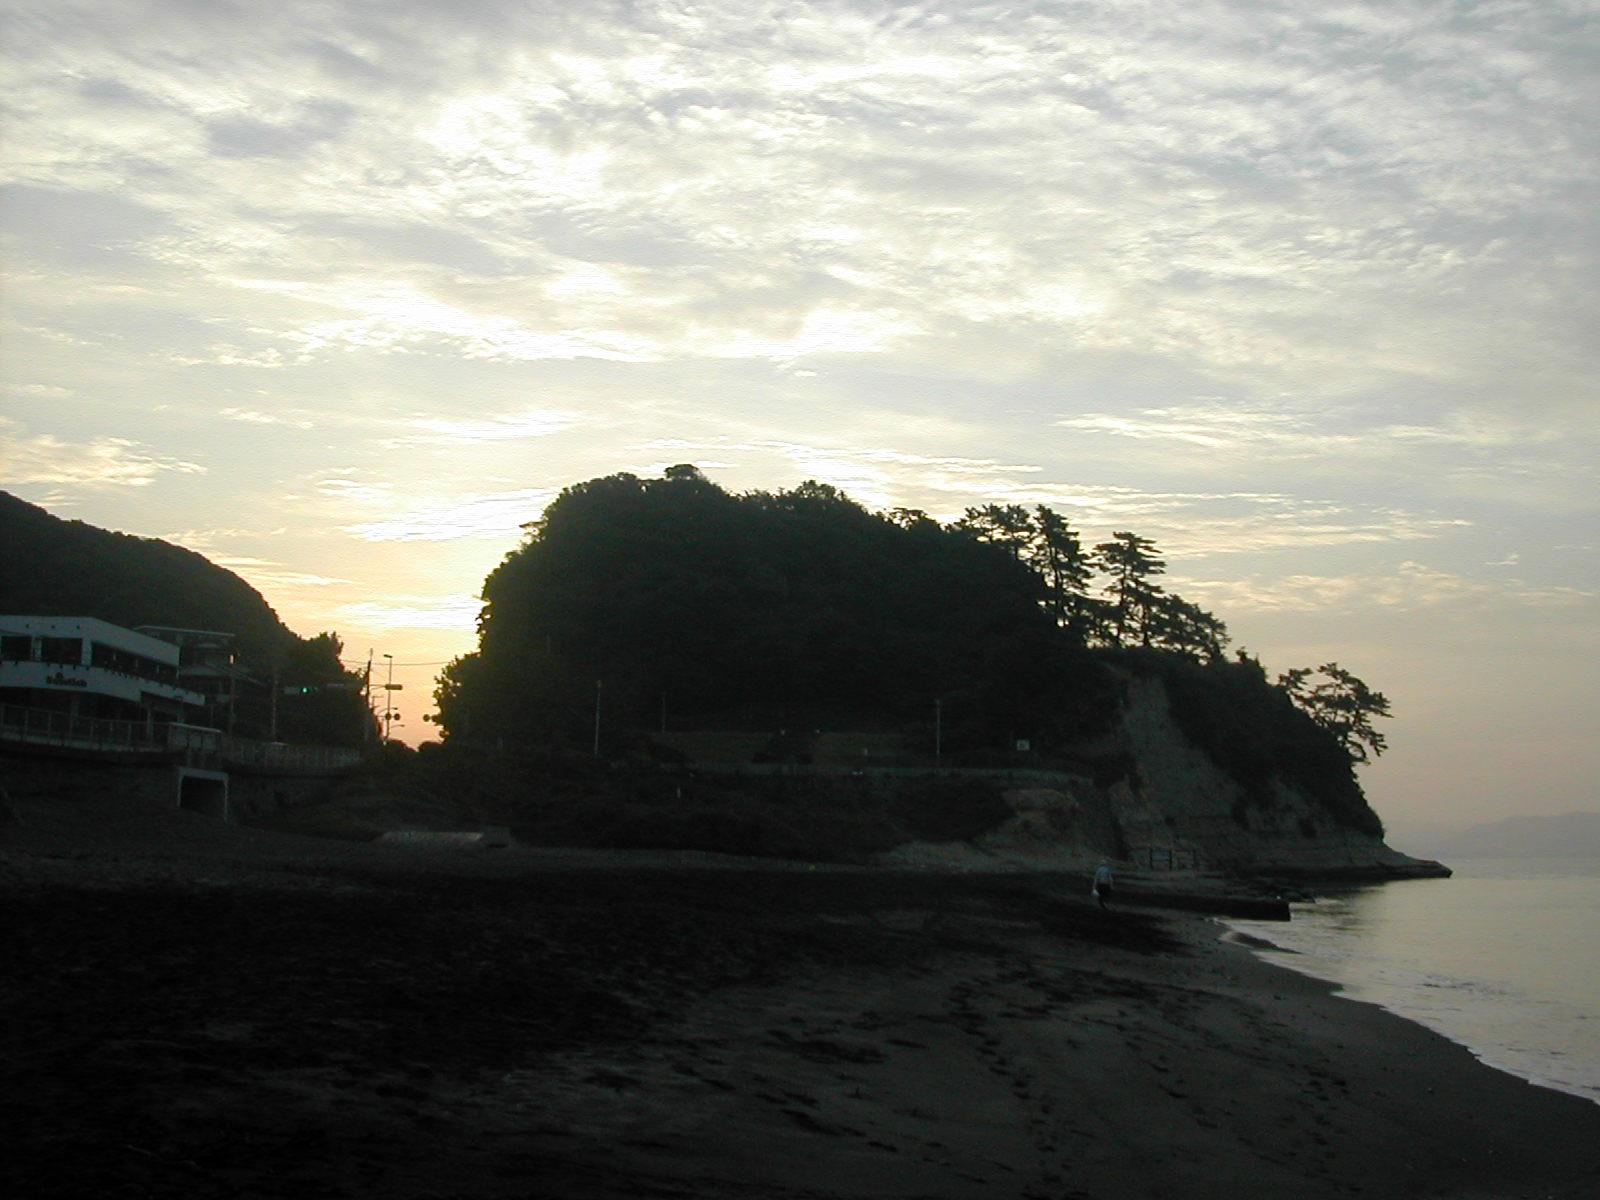 20105_014_3